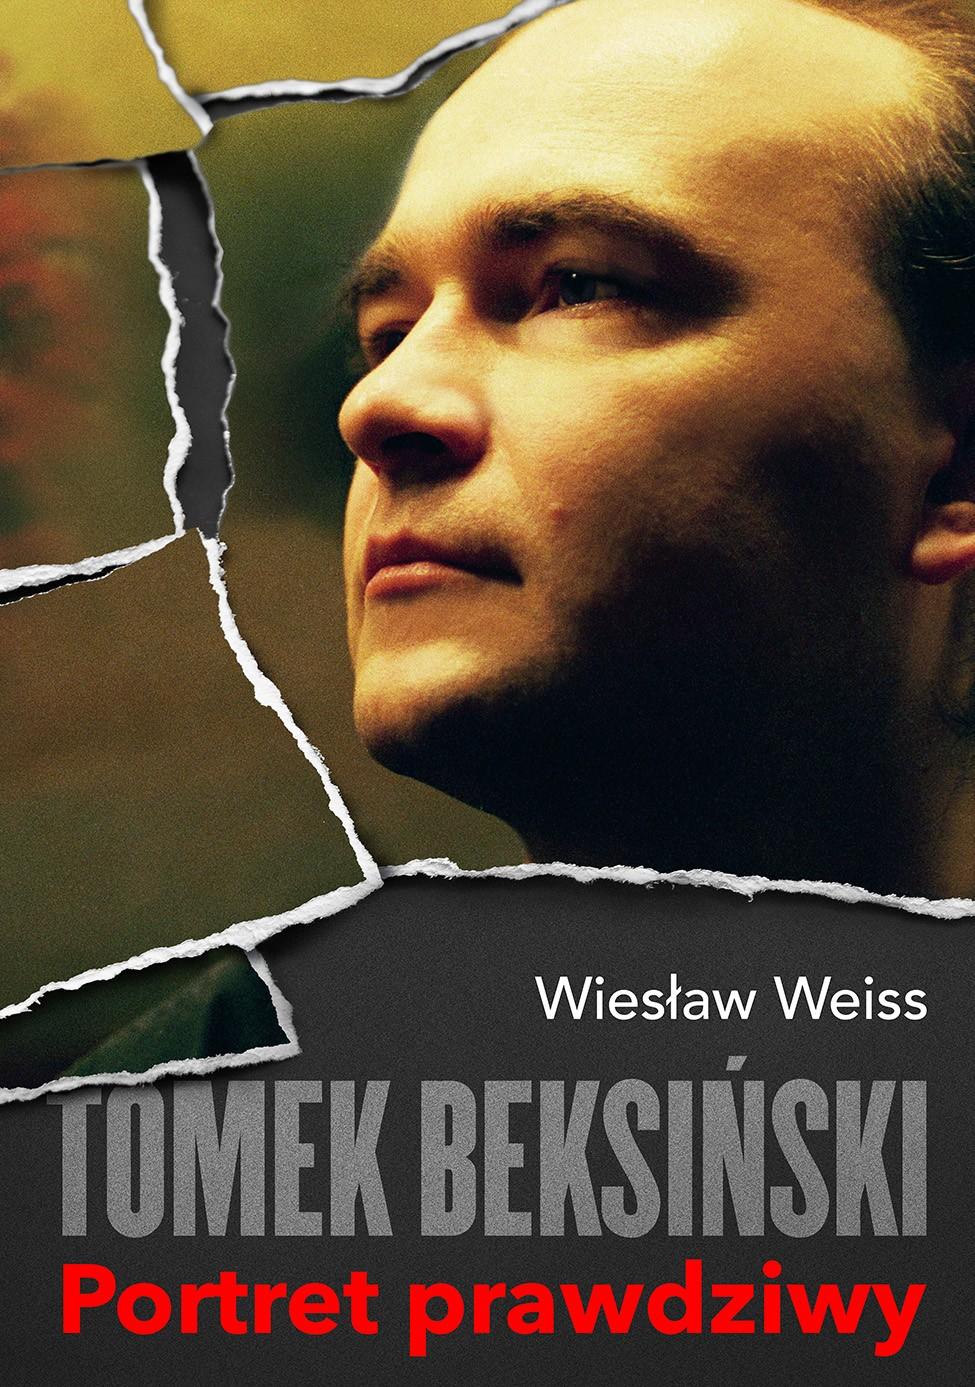 Beksinski portret_okl_final_A